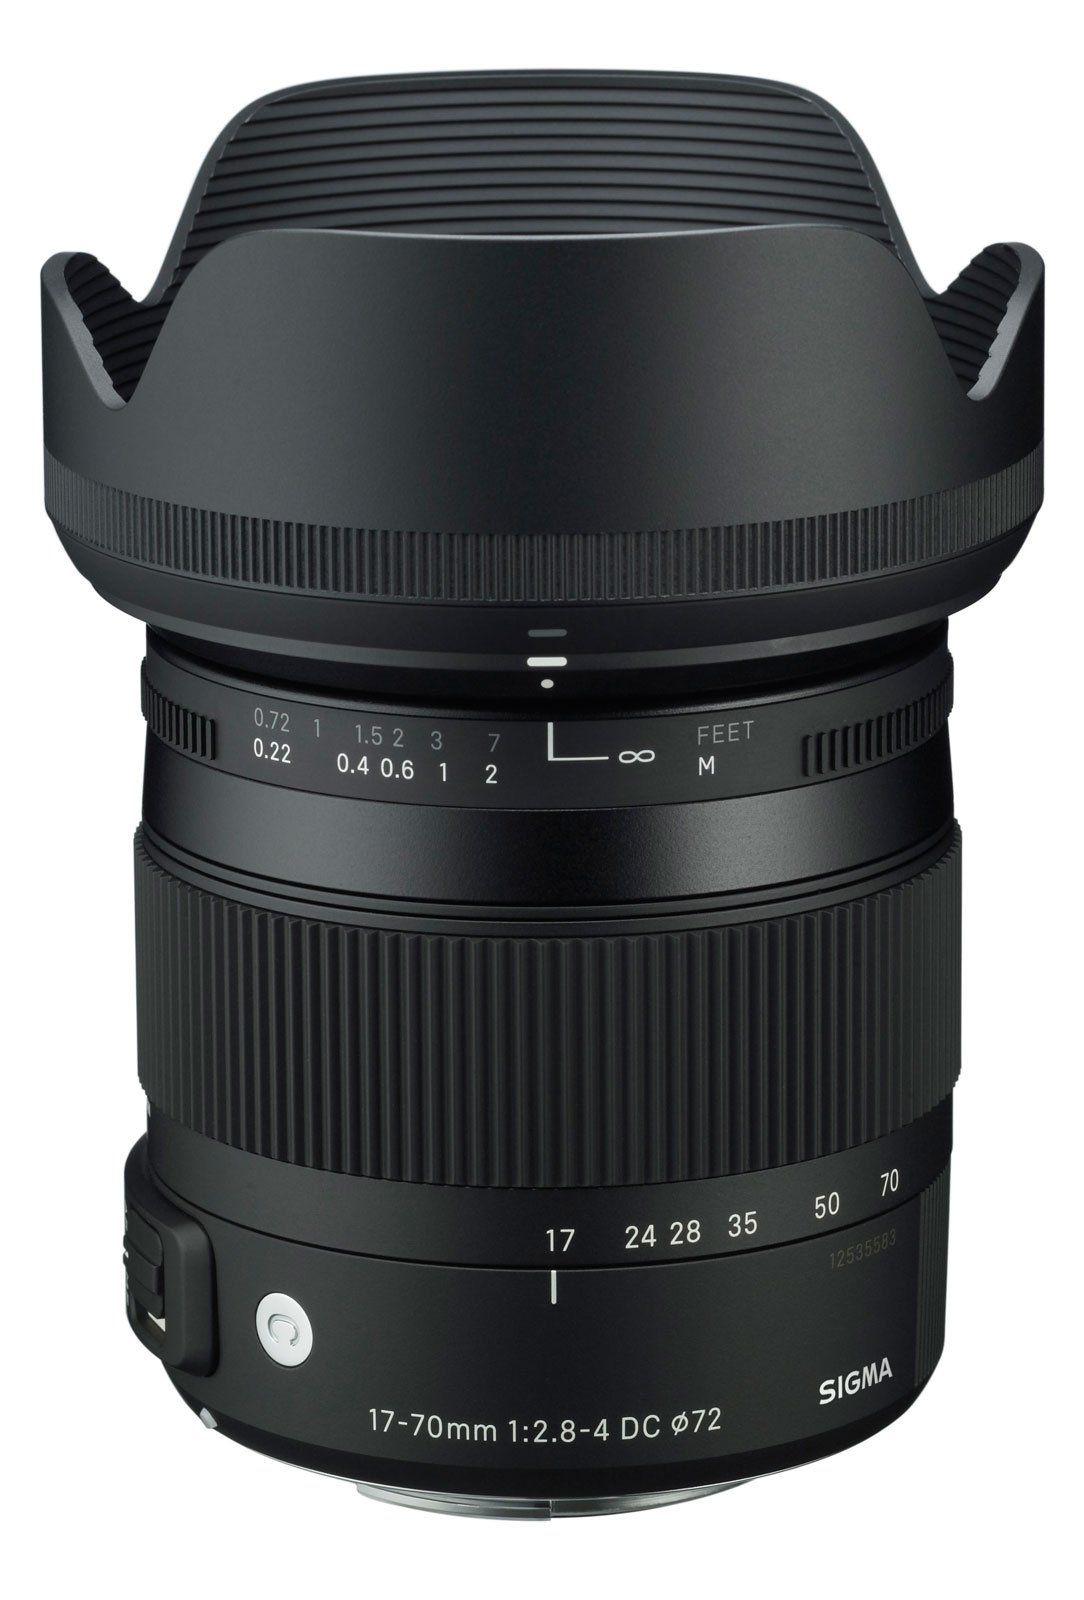 Das Ultimative Reiseobjektiv Produktfotografie Nikon Dslr Fotoausrustung